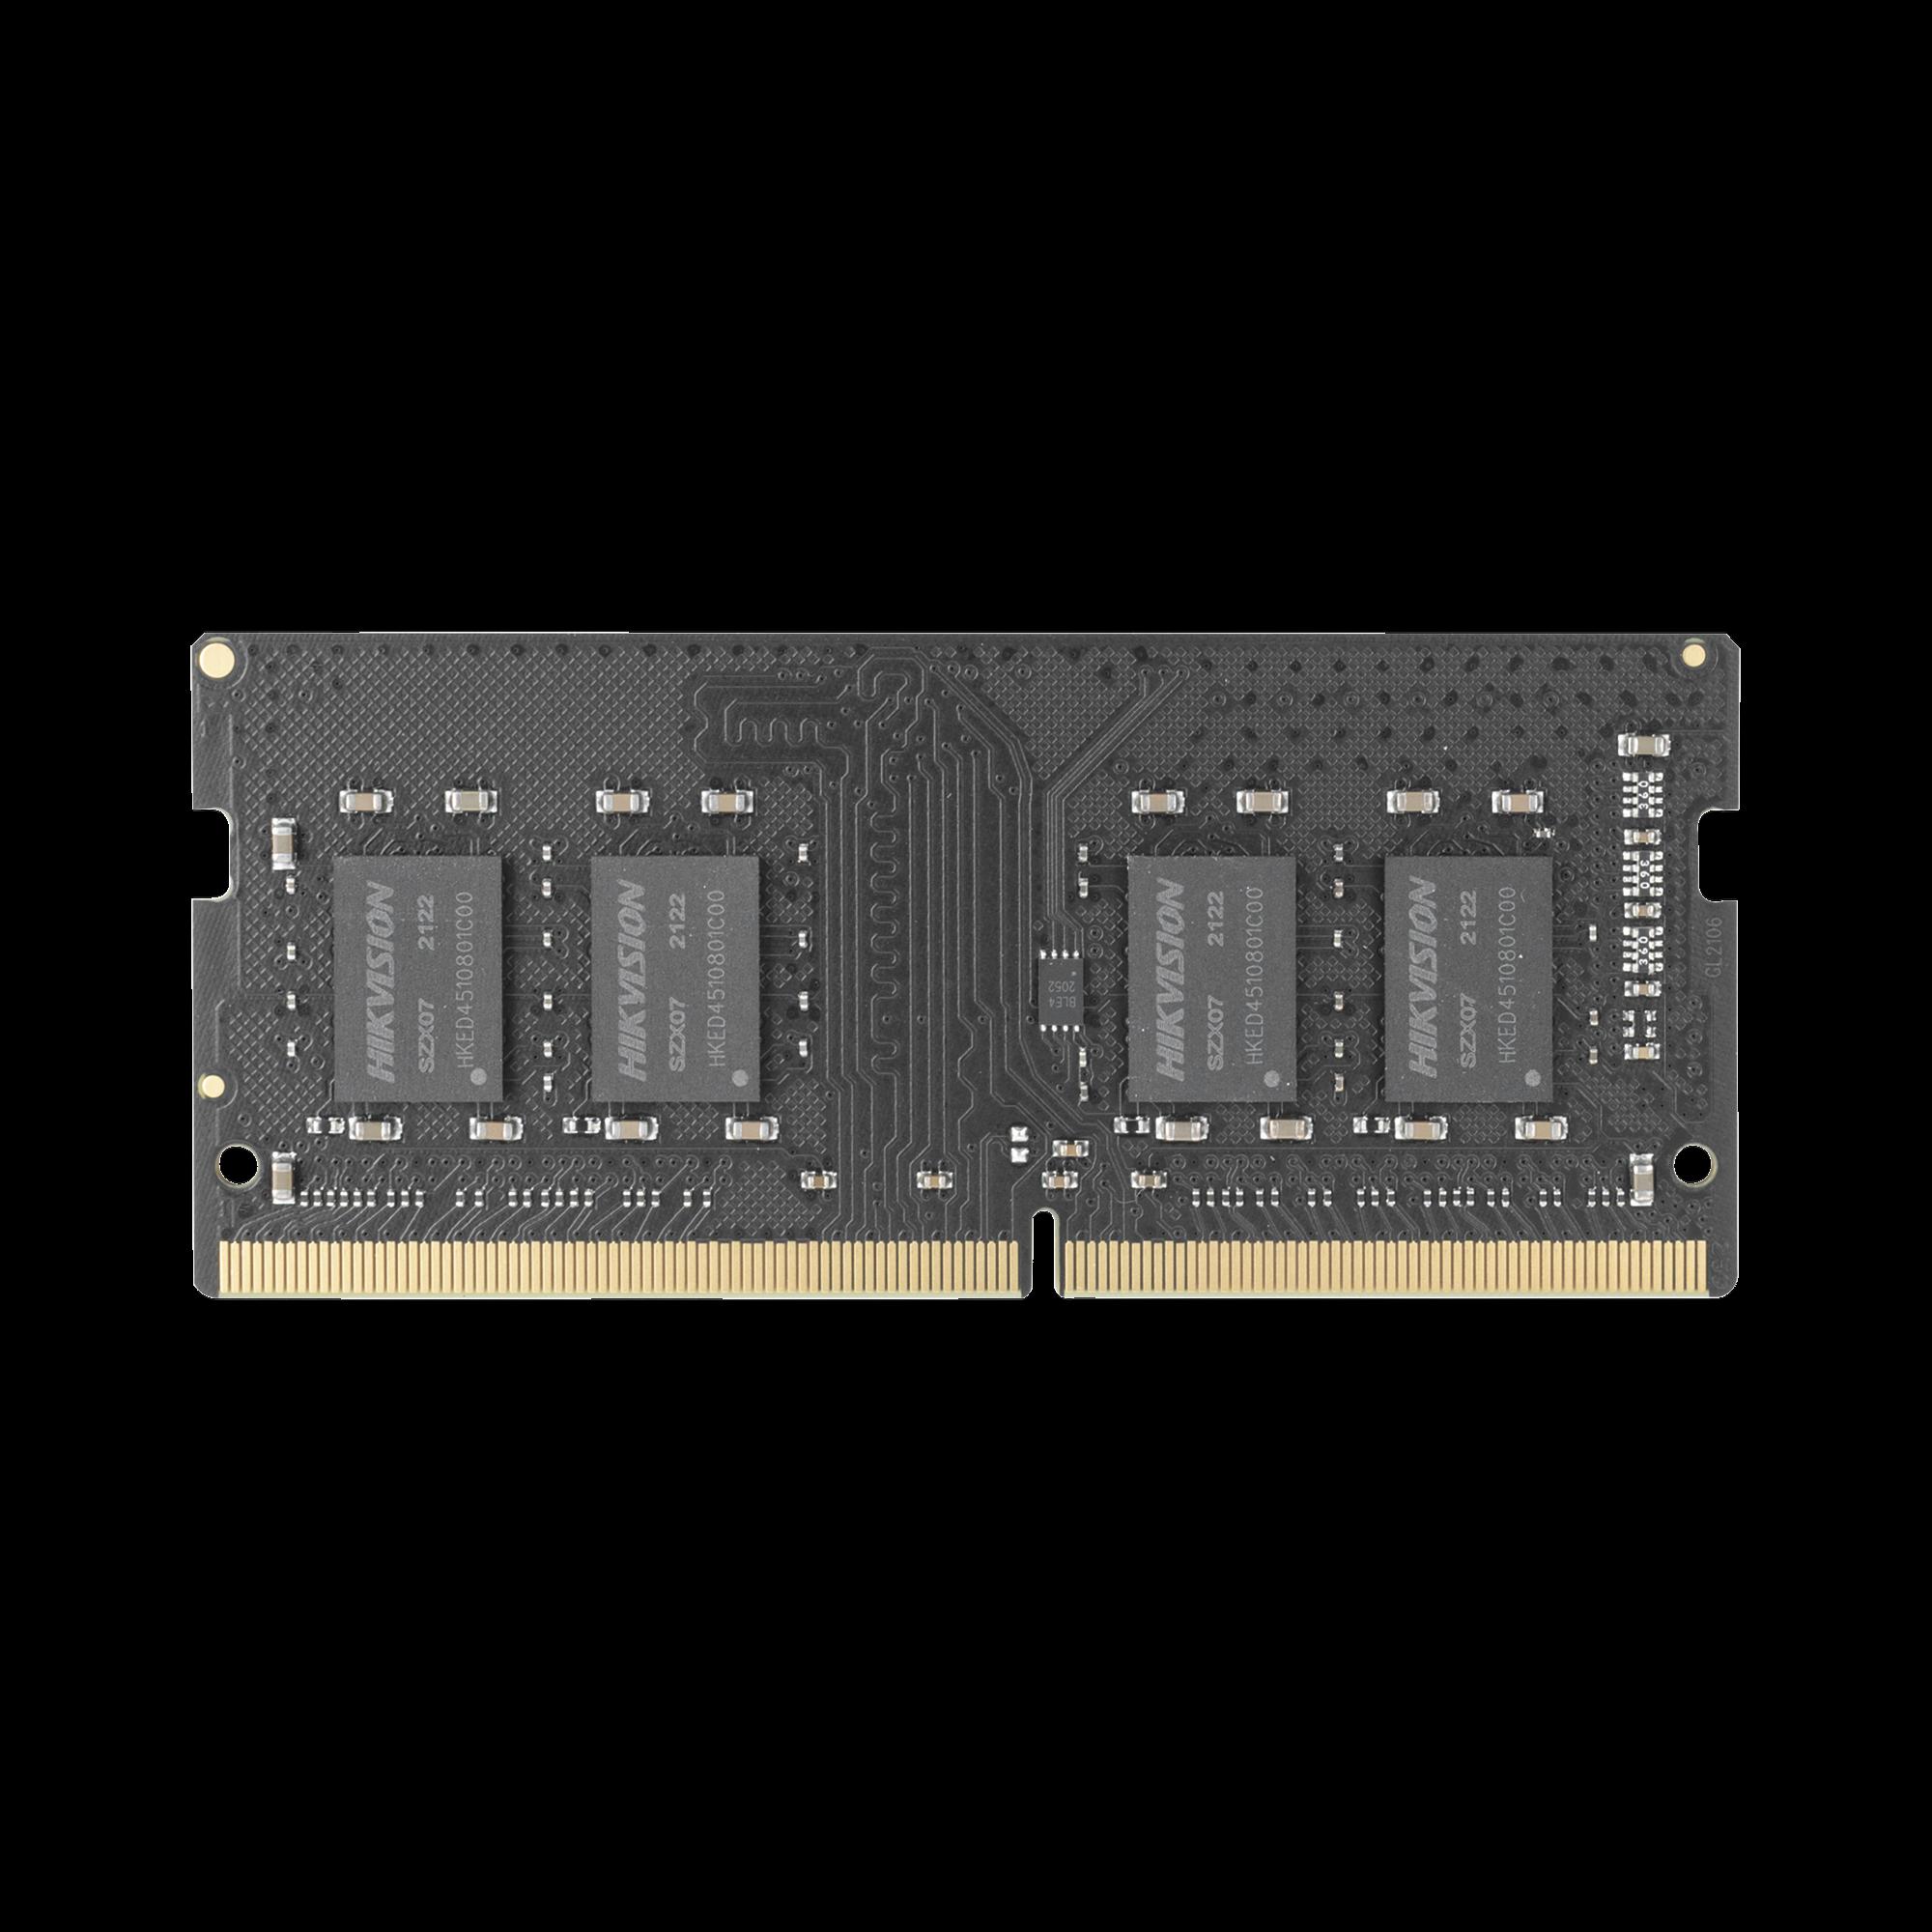 Modulo de Memoria RAM 4 GB / 2666 MHz / SODIMM